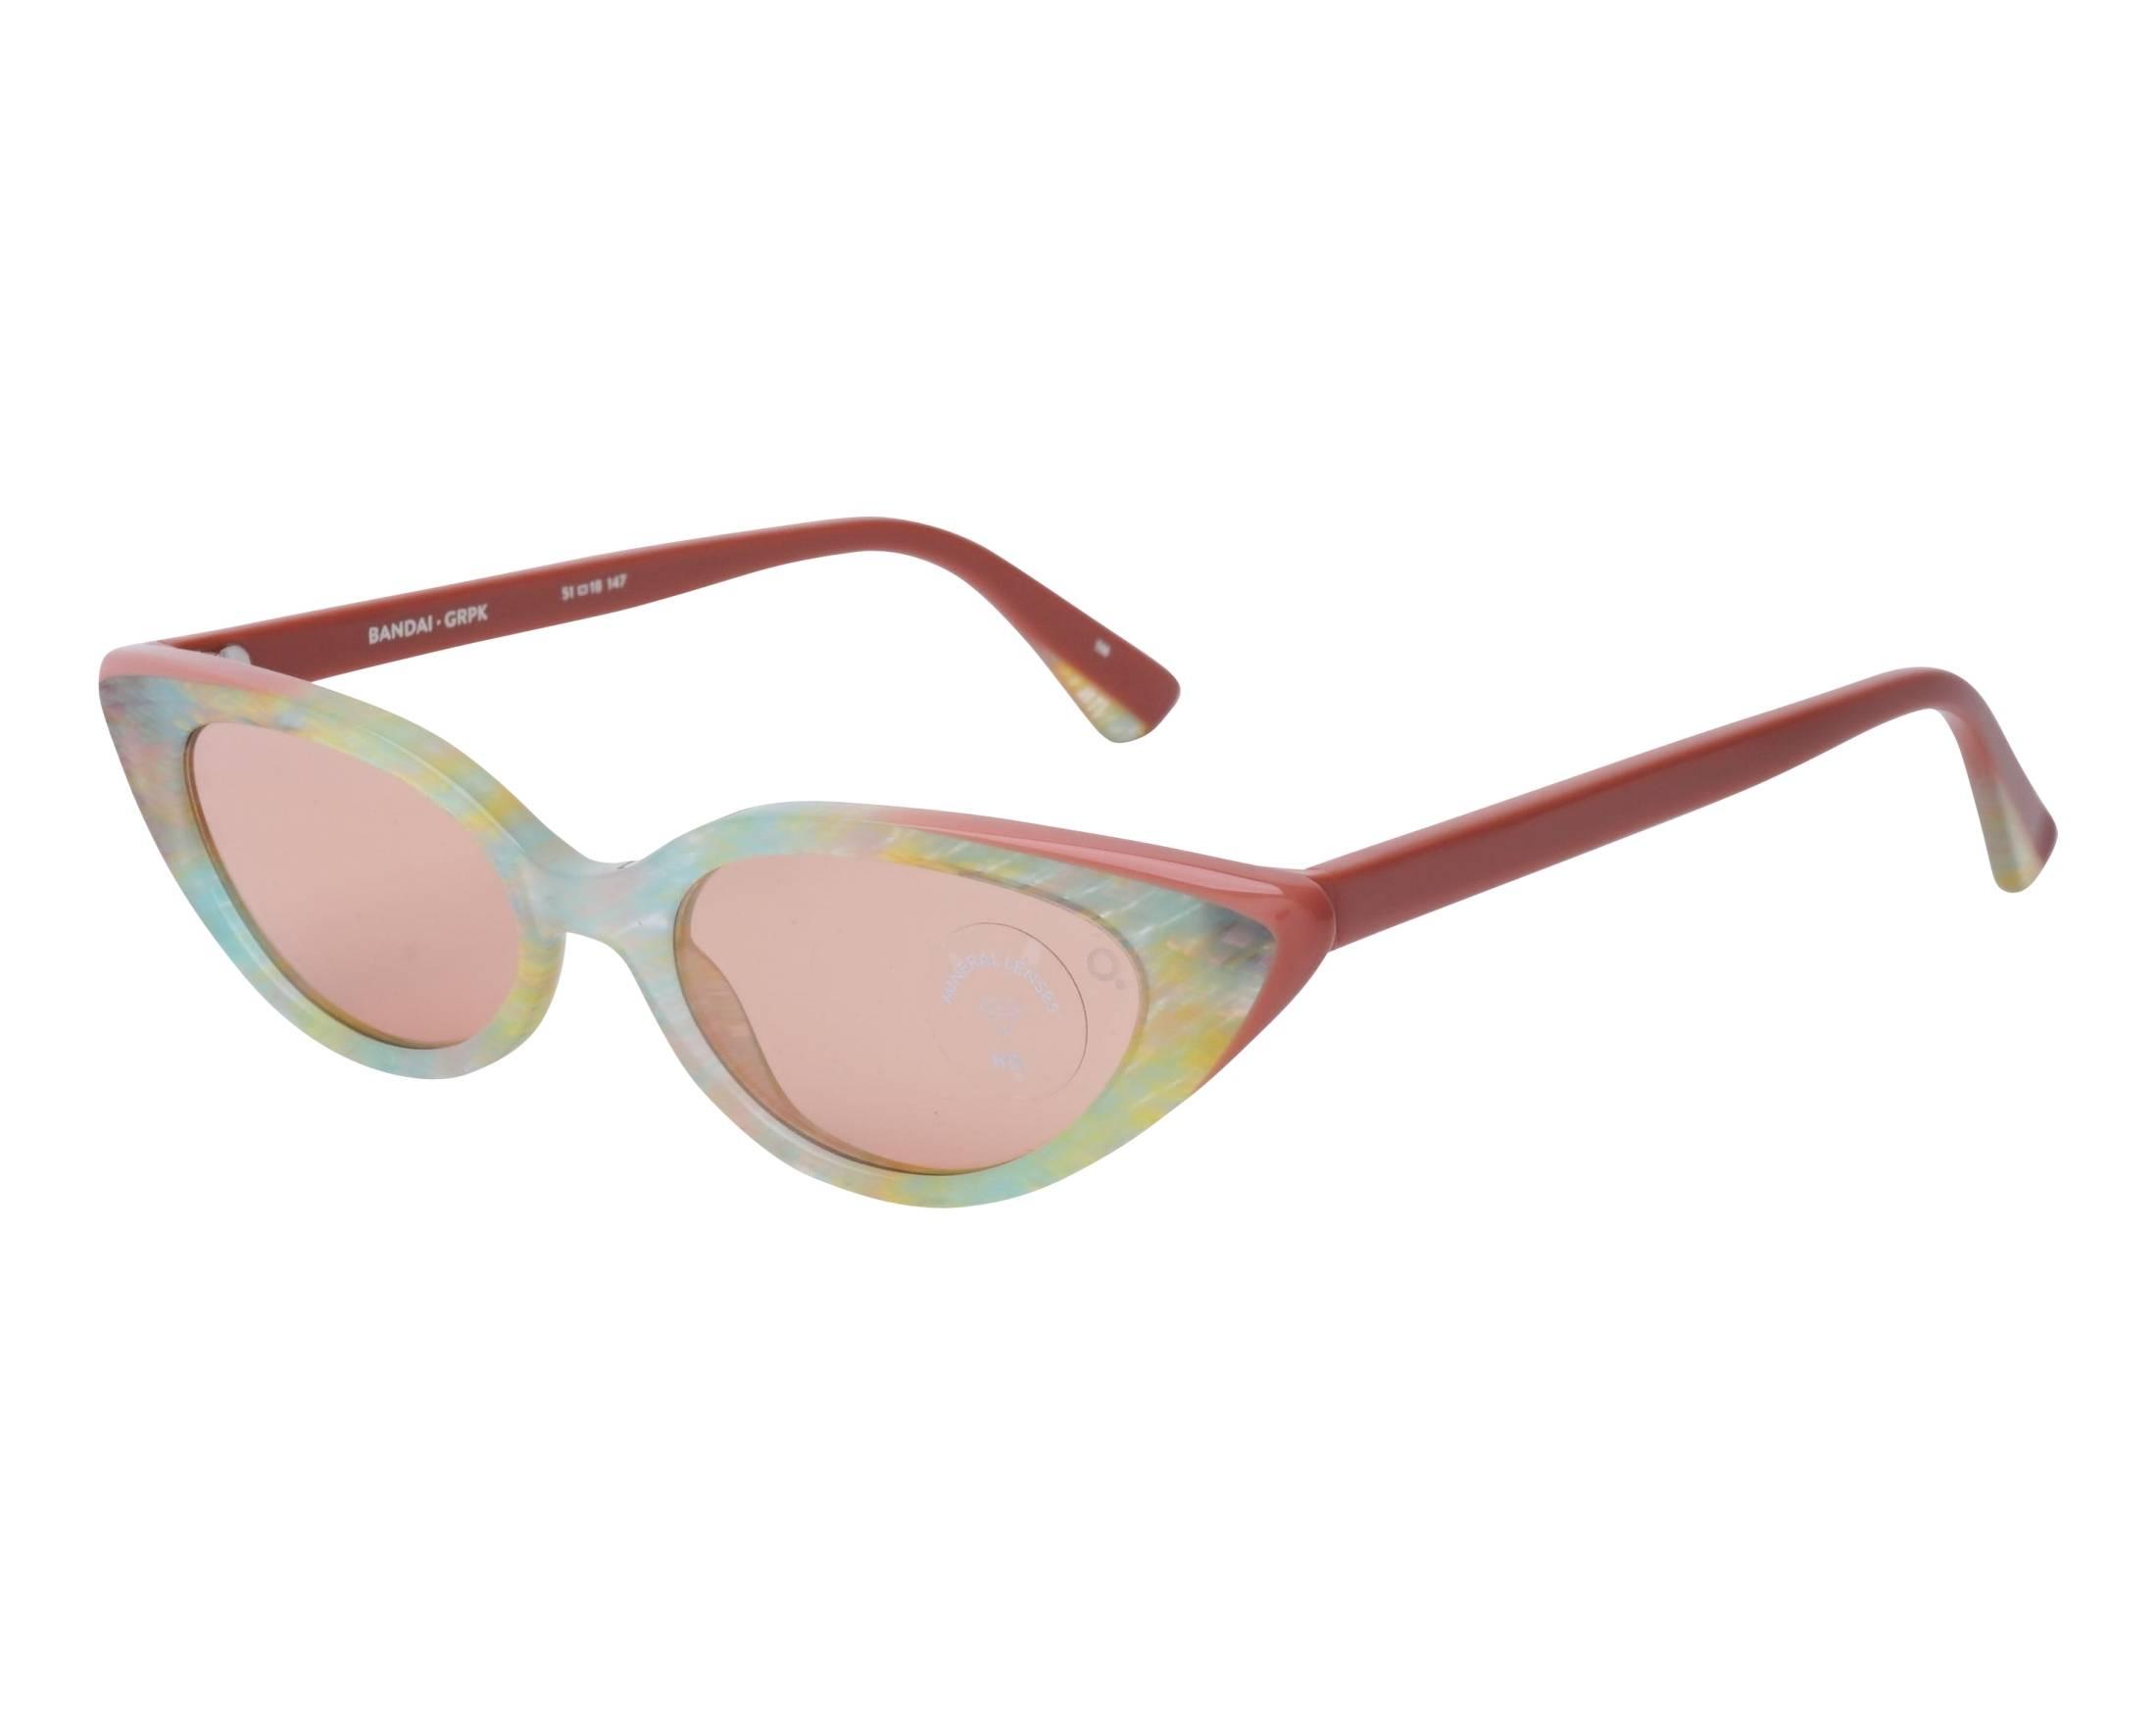 5f2f01edea Sunglasses Etnia Barcelona BANDAI GRPK 51-18 Marble Rosa profile view